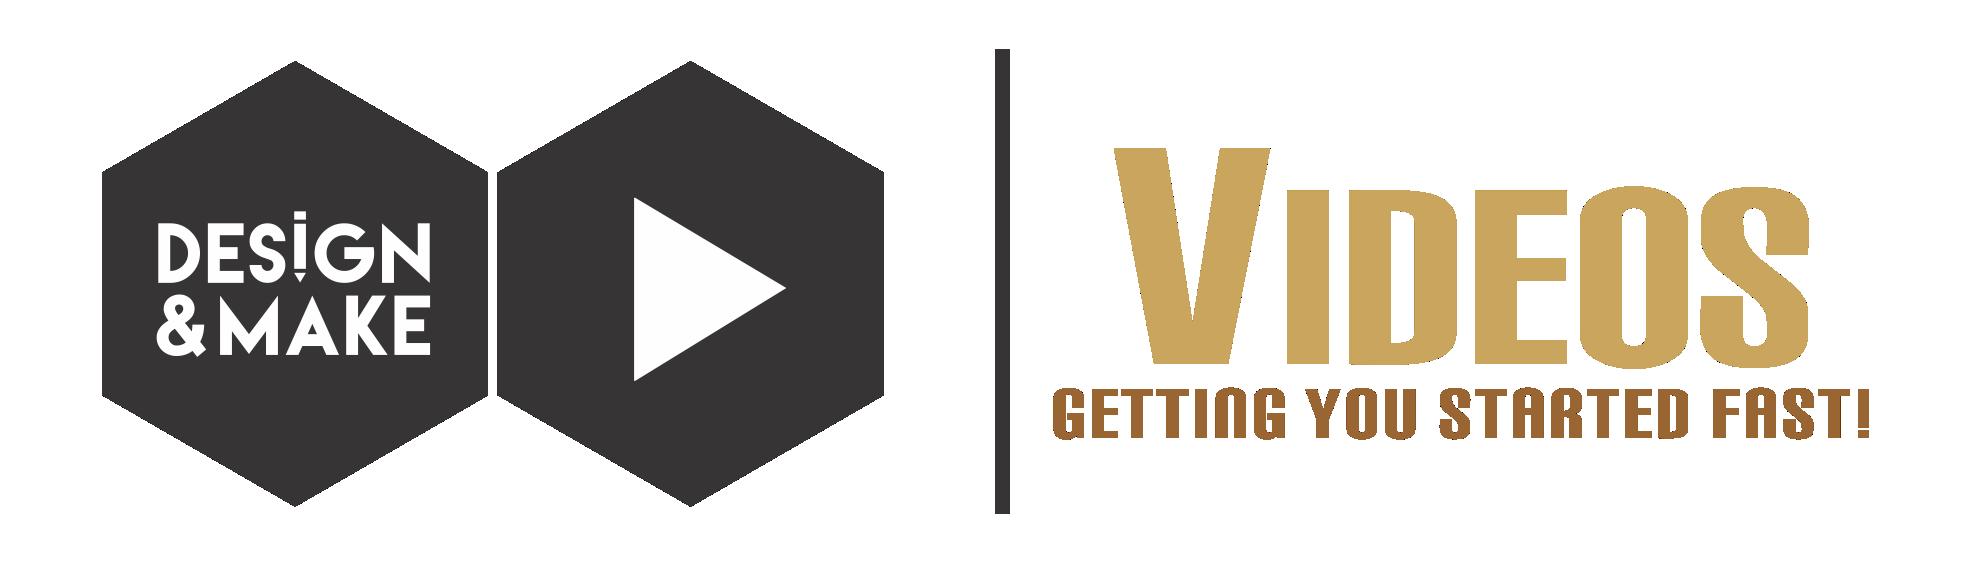 Design and Make Videos